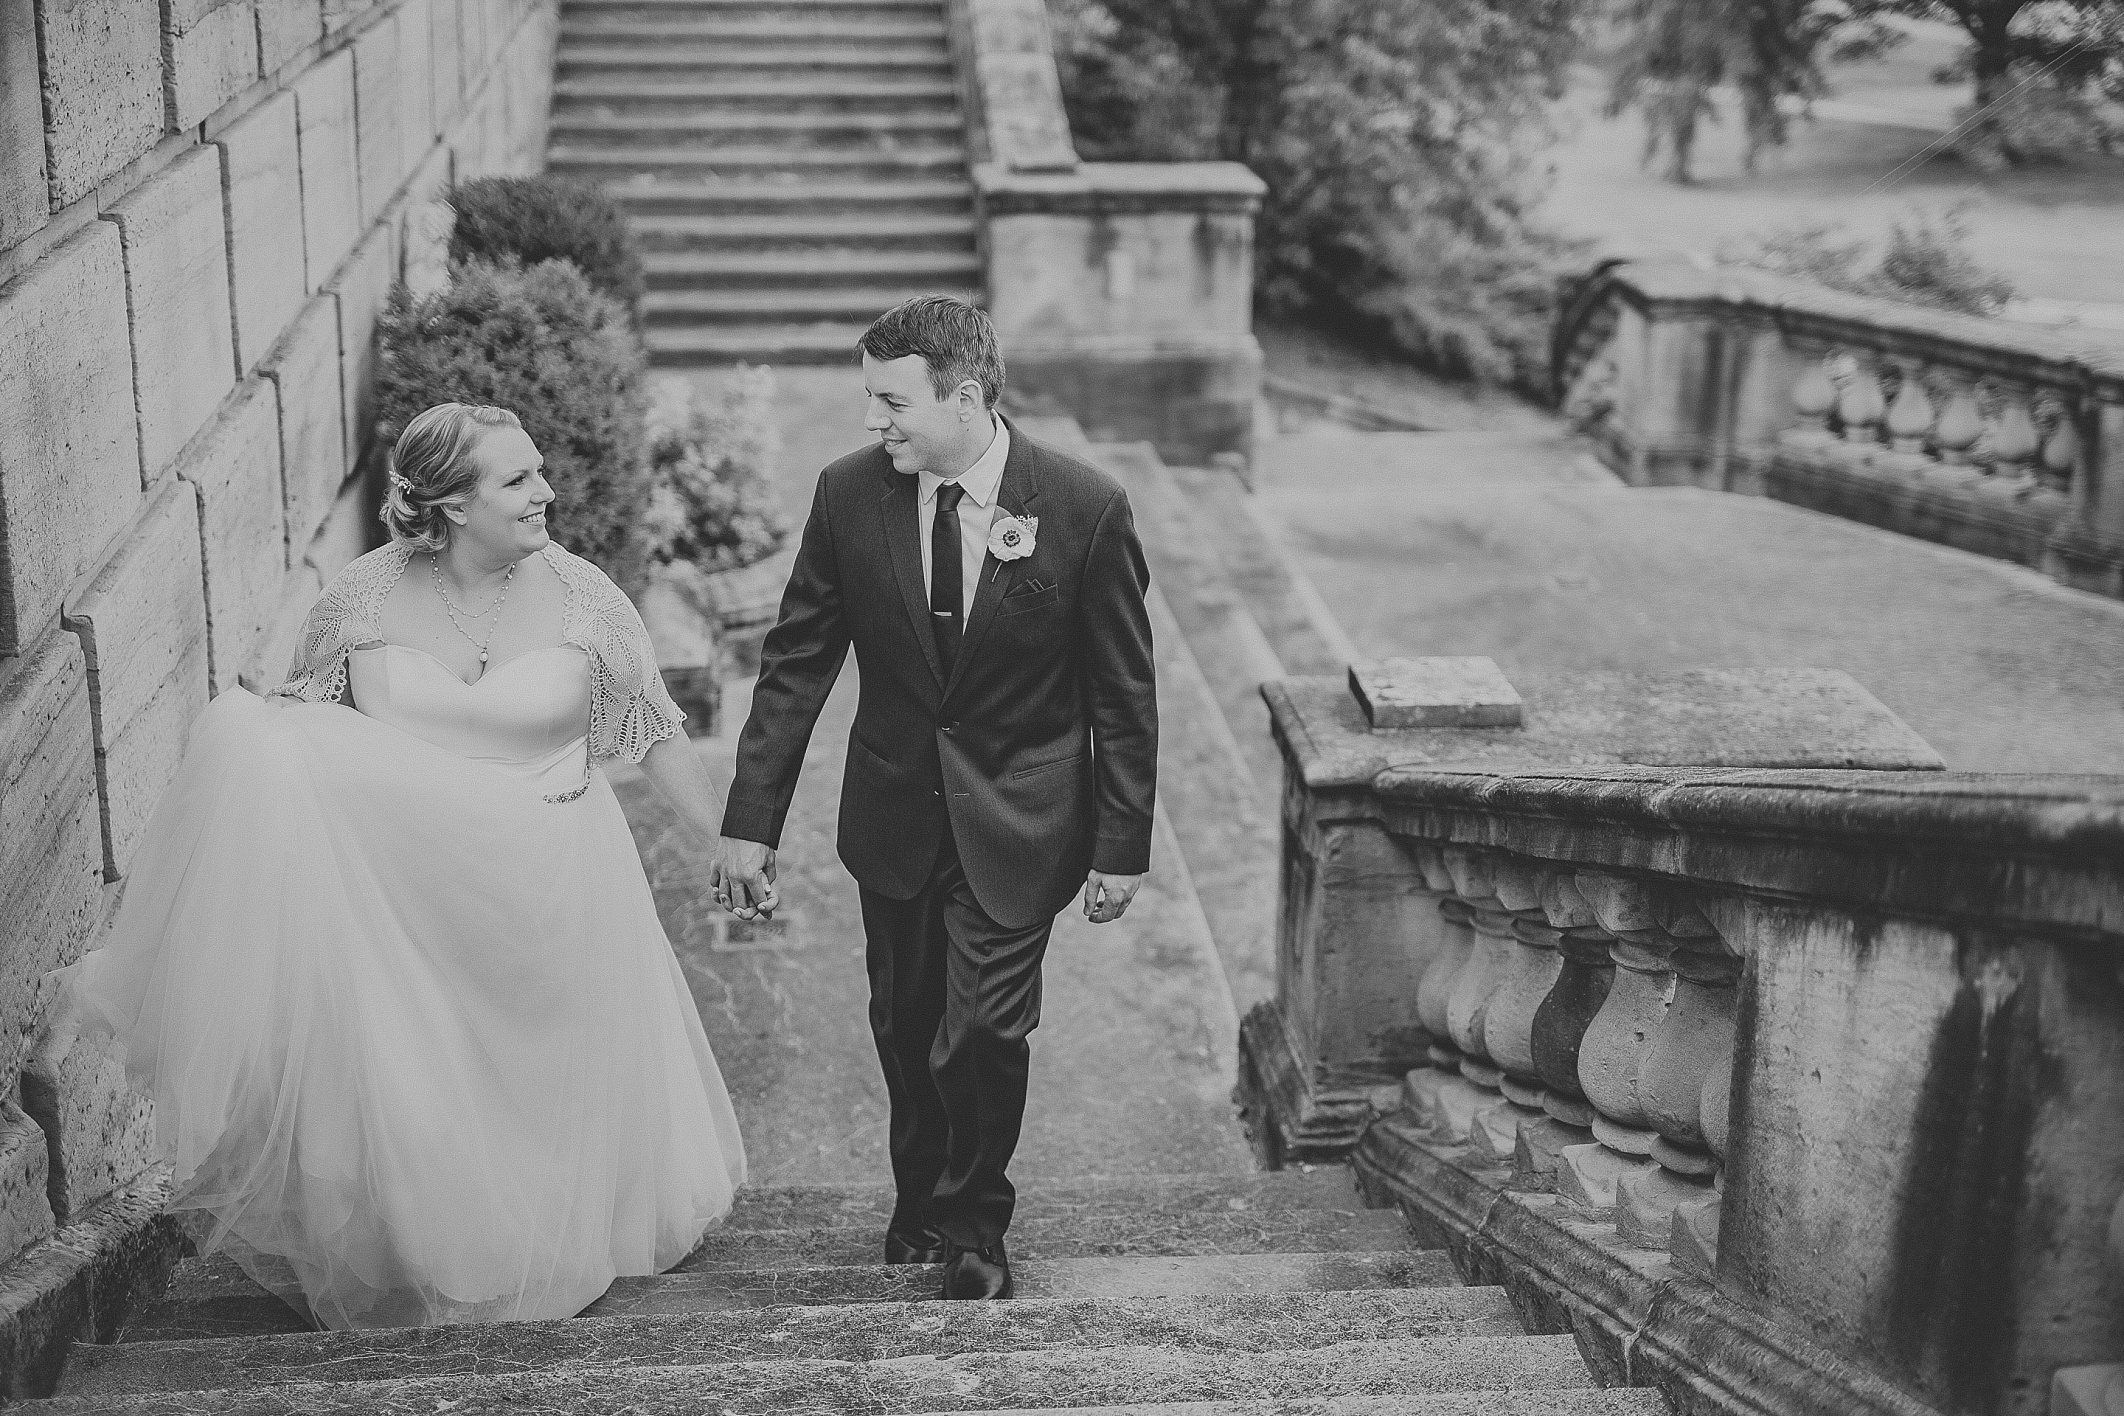 wedding-photographer-dayton-ohio_0011.jpg